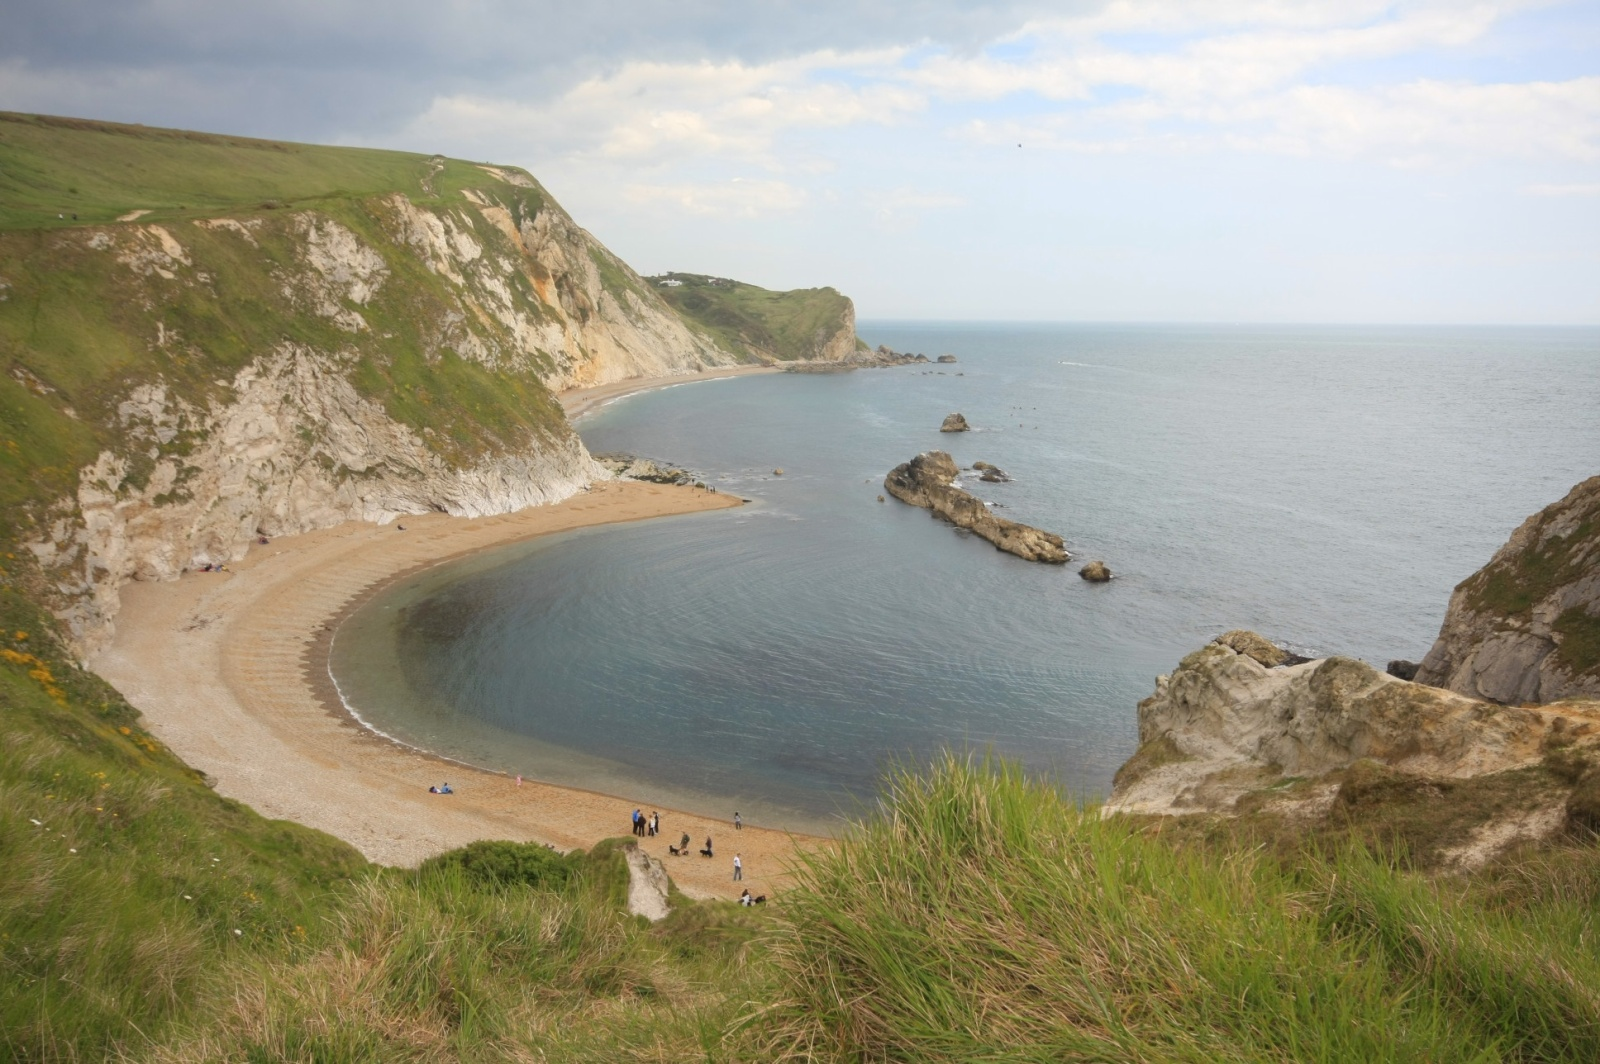 Southern England